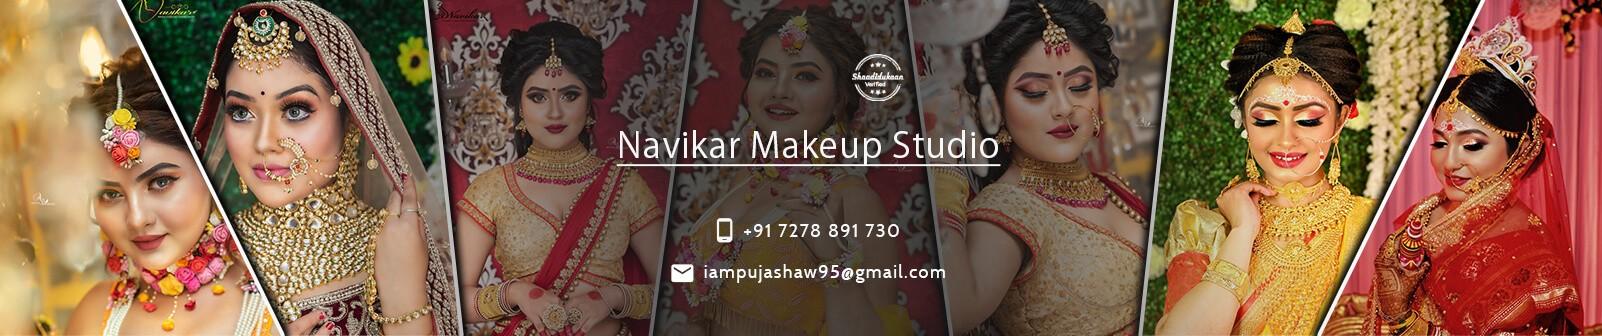 navikar-makeup-studio